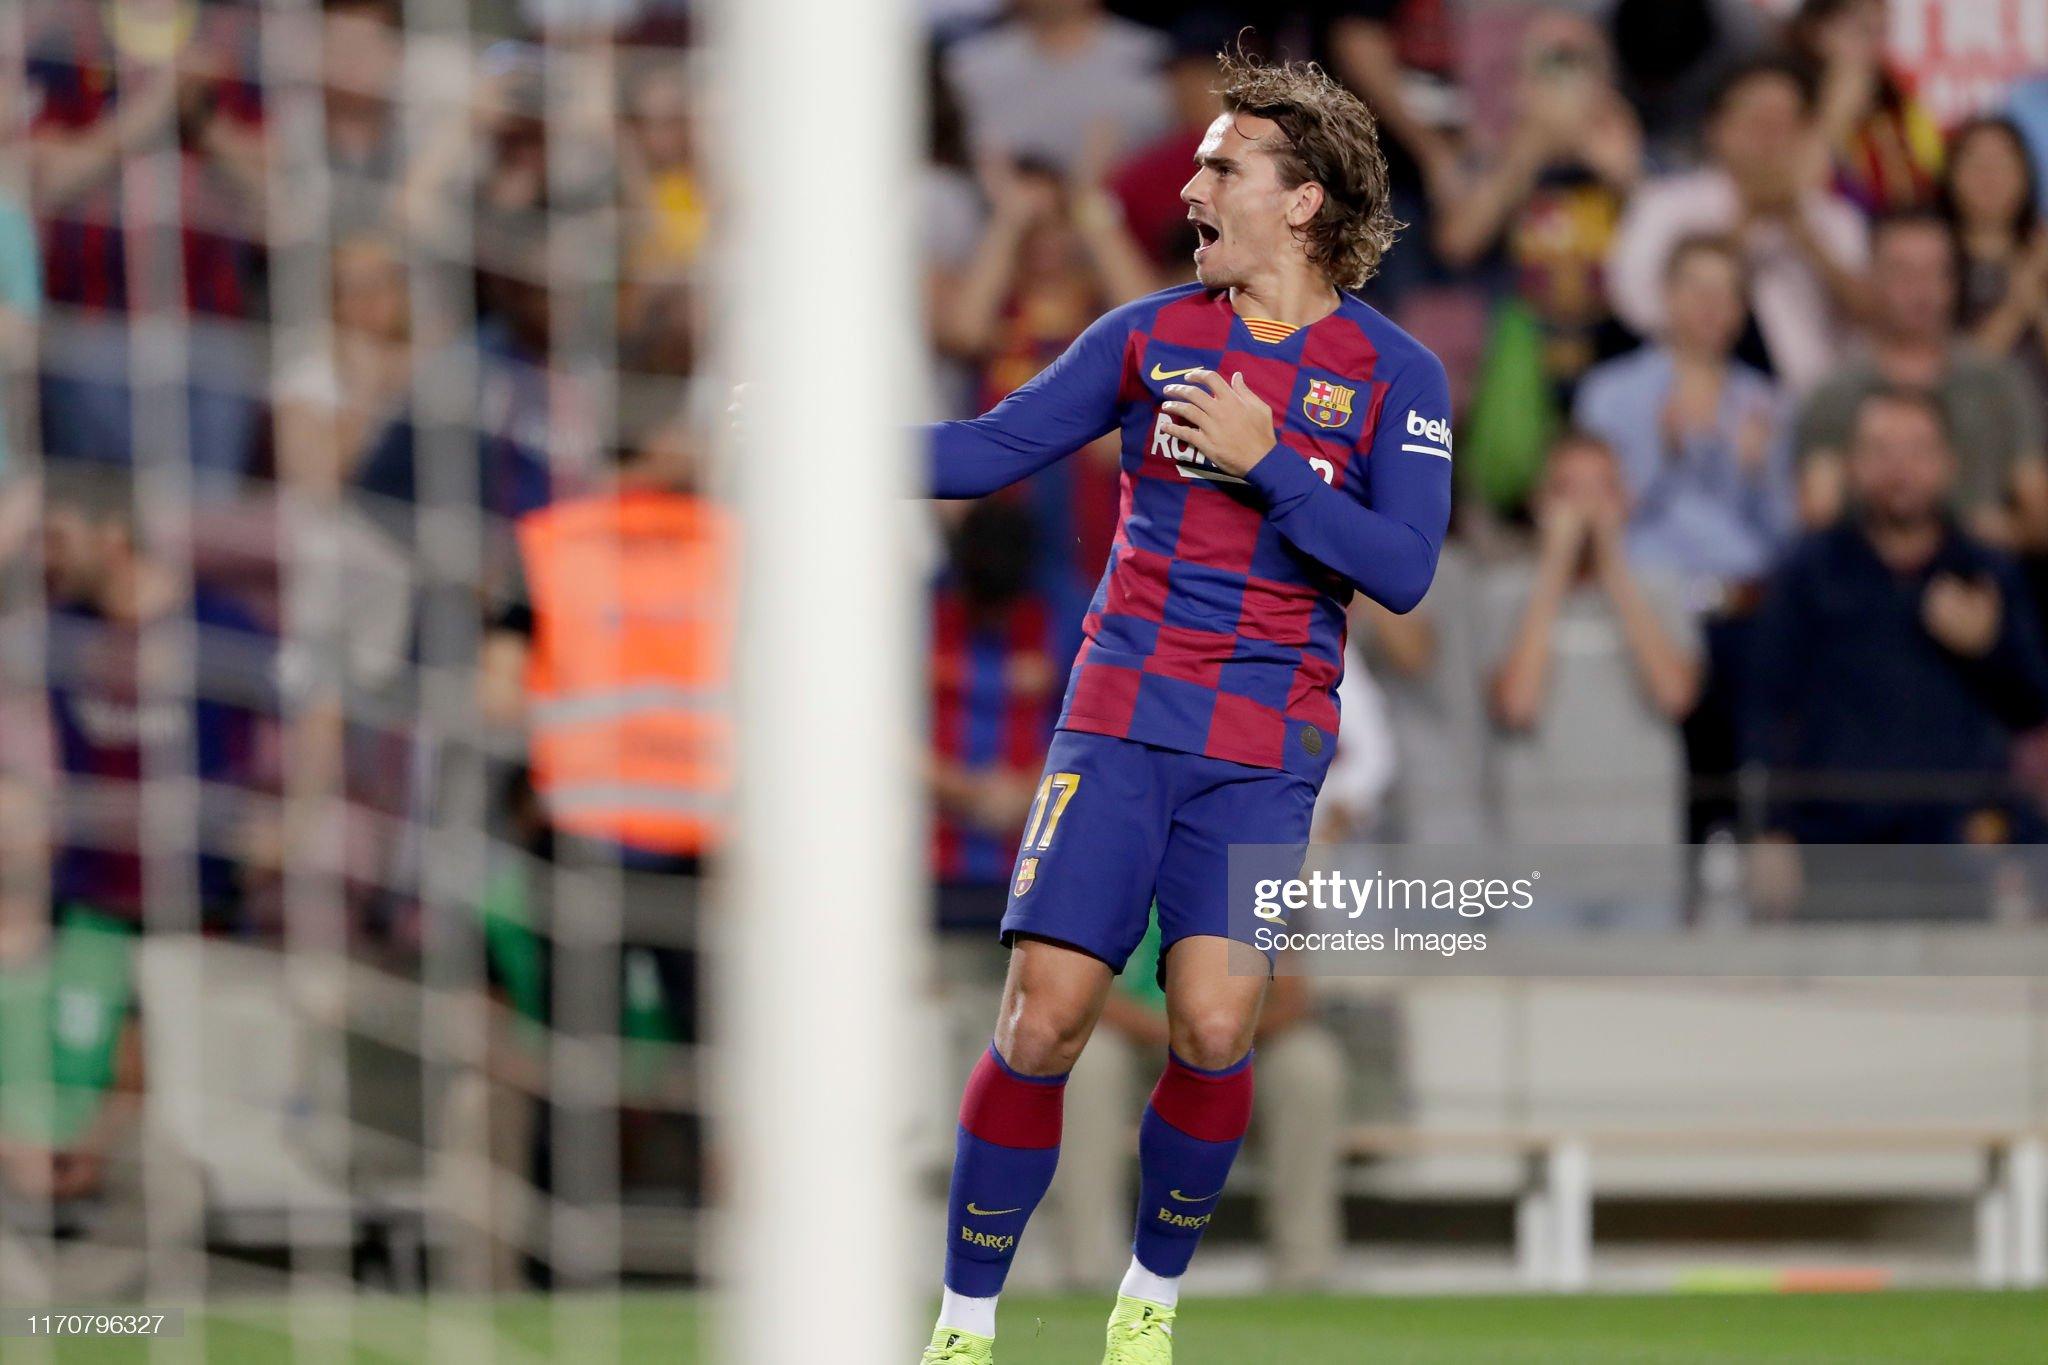 صور مباراة : برشلونة - فياريال 2-1 ( 24-09-2019 )  Antoine-griezmann-of-fc-barcelona-celebratess-10-during-the-la-liga-picture-id1170796327?s=2048x2048